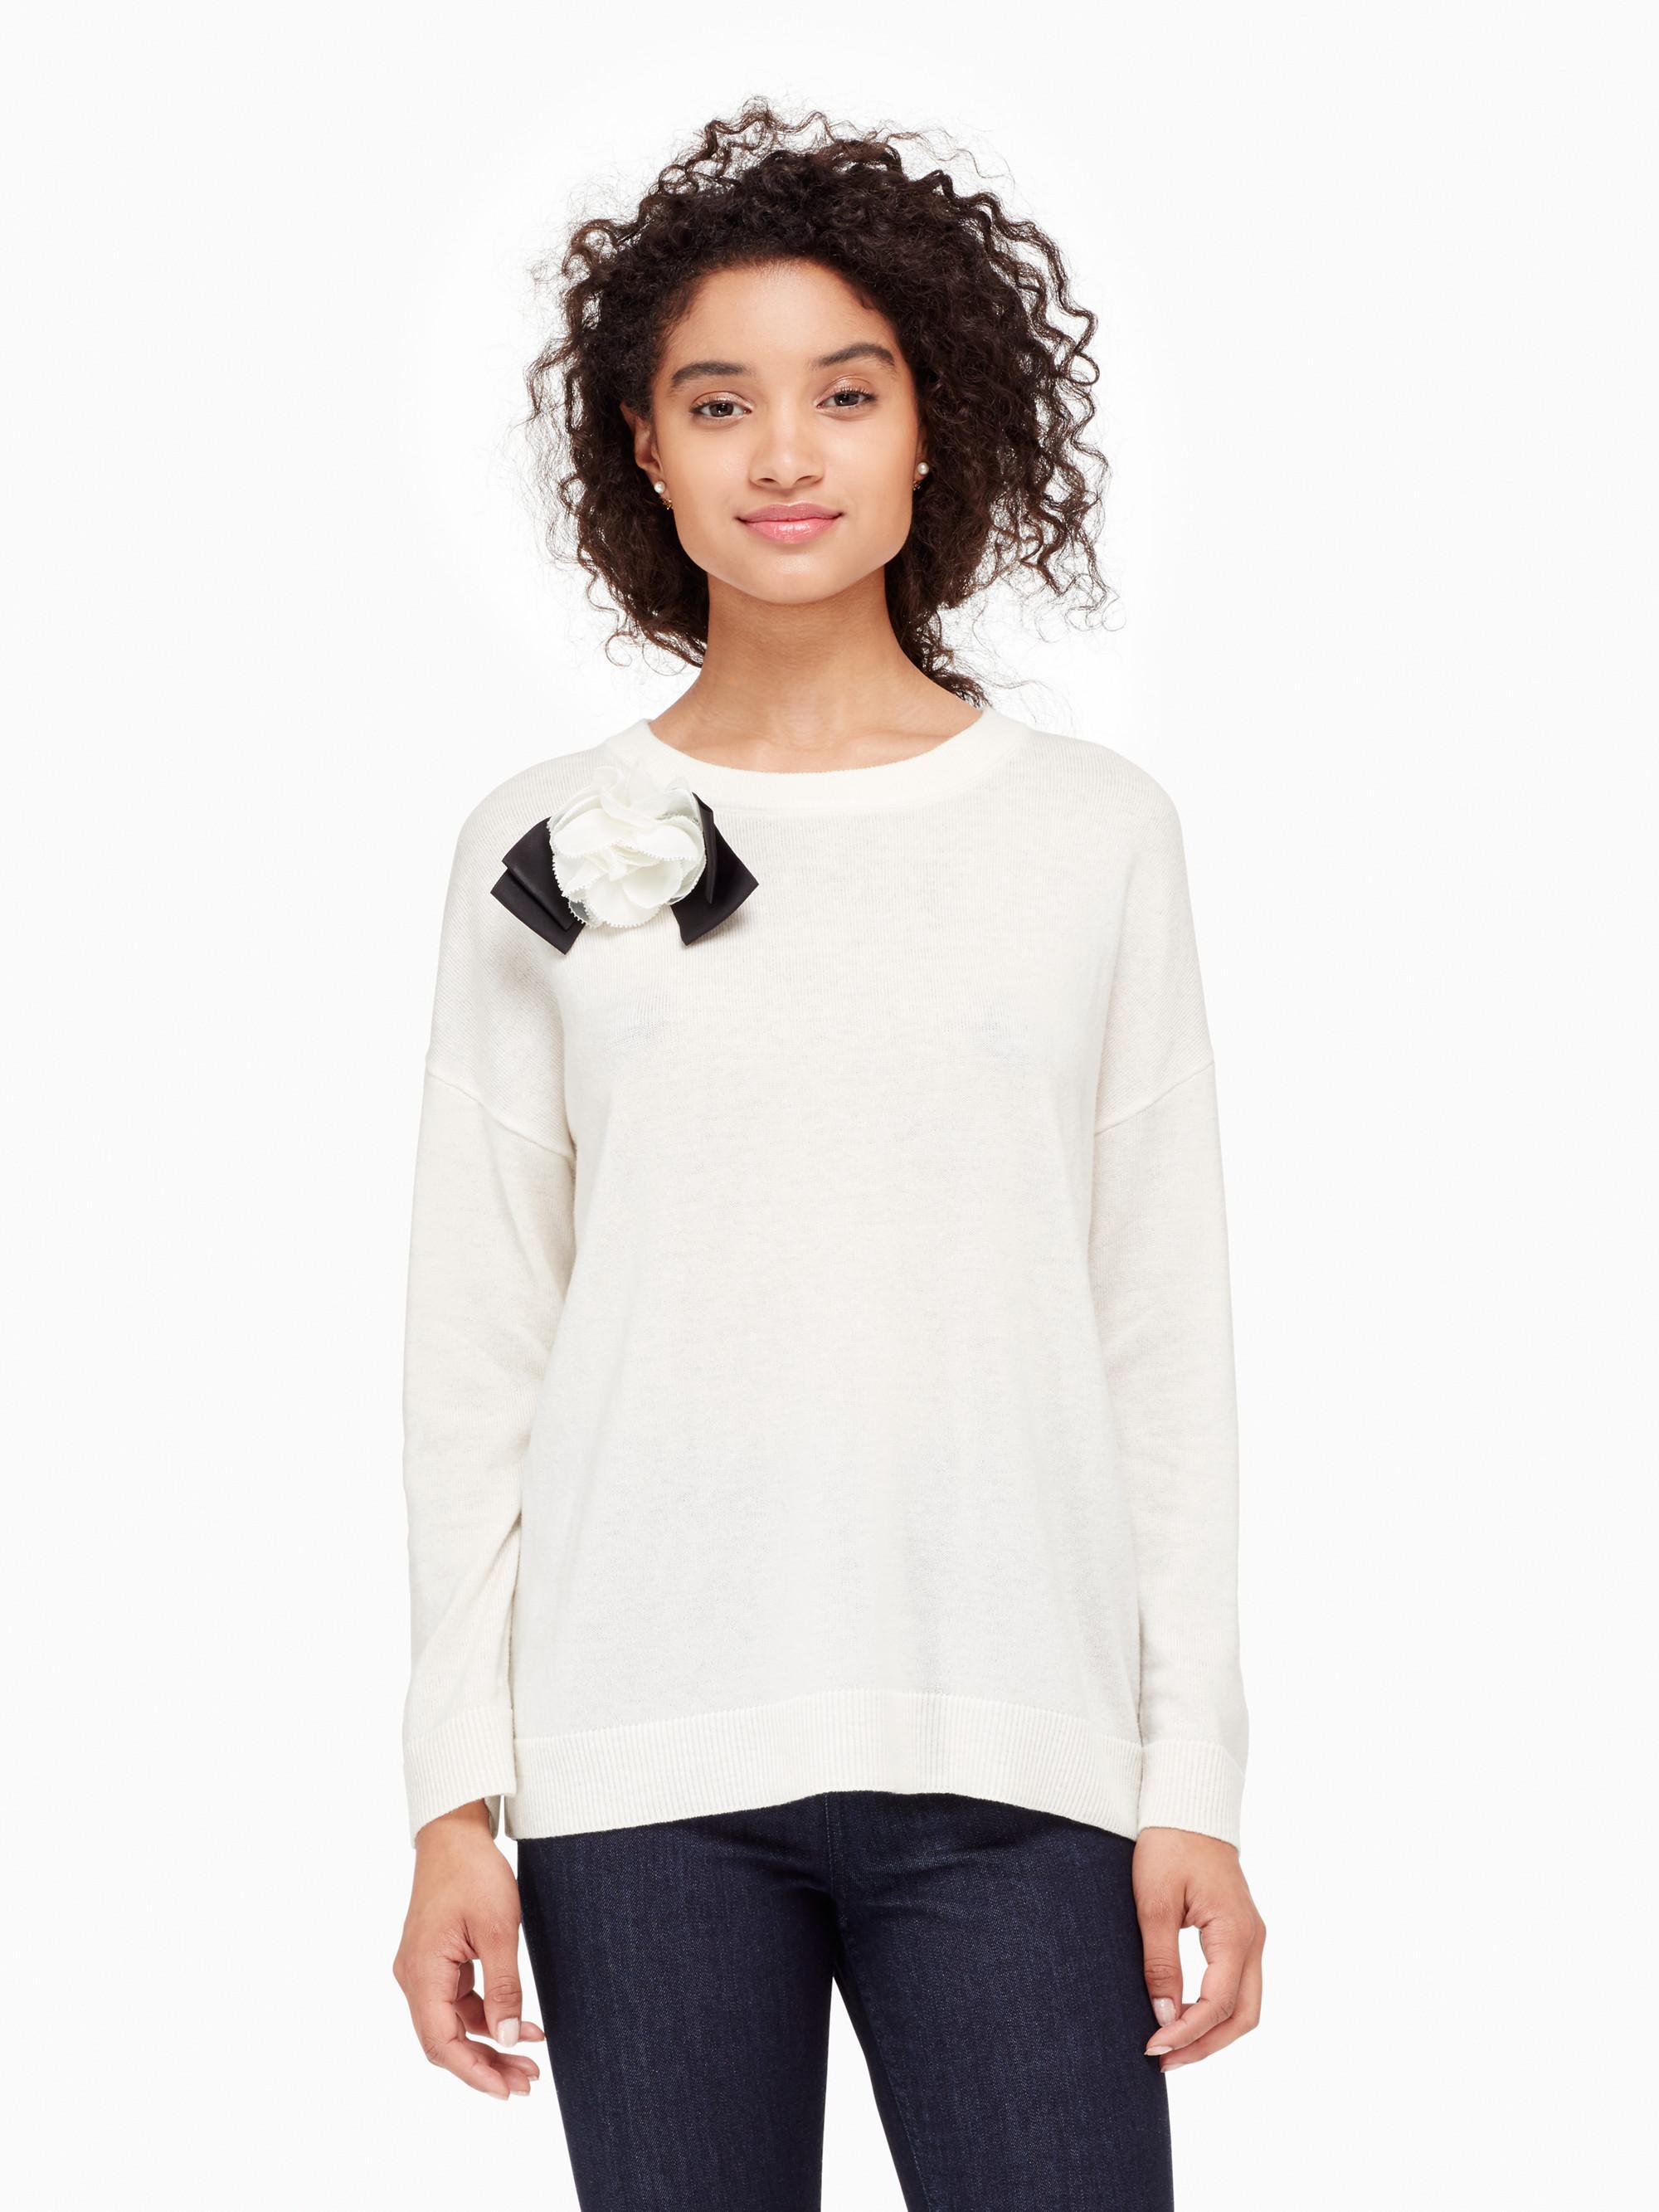 Kate Spade Bow Sweater January 2017